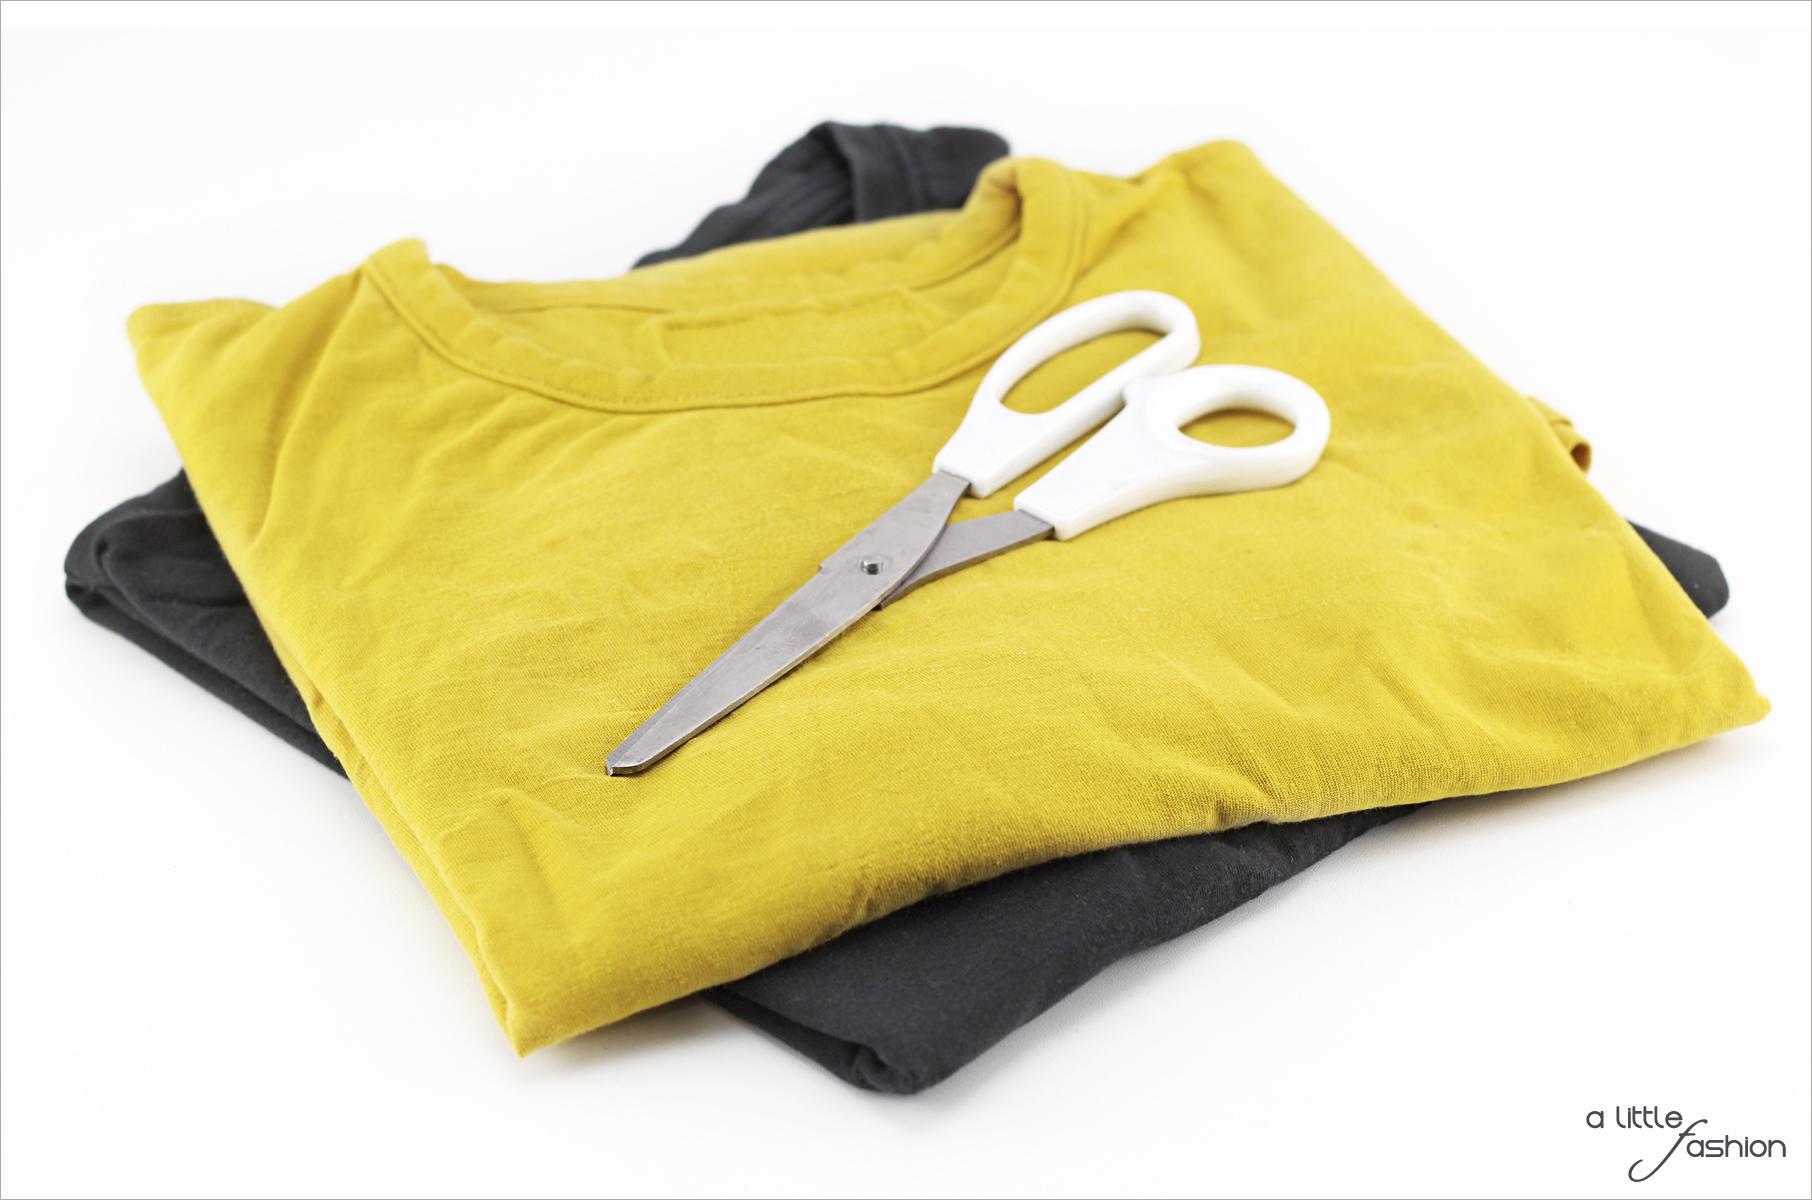 Kette aus alten T-Shirts  |  A Little Fashion  |  https://www.filizity.com/diy/kette-aus-alten-t-shirts